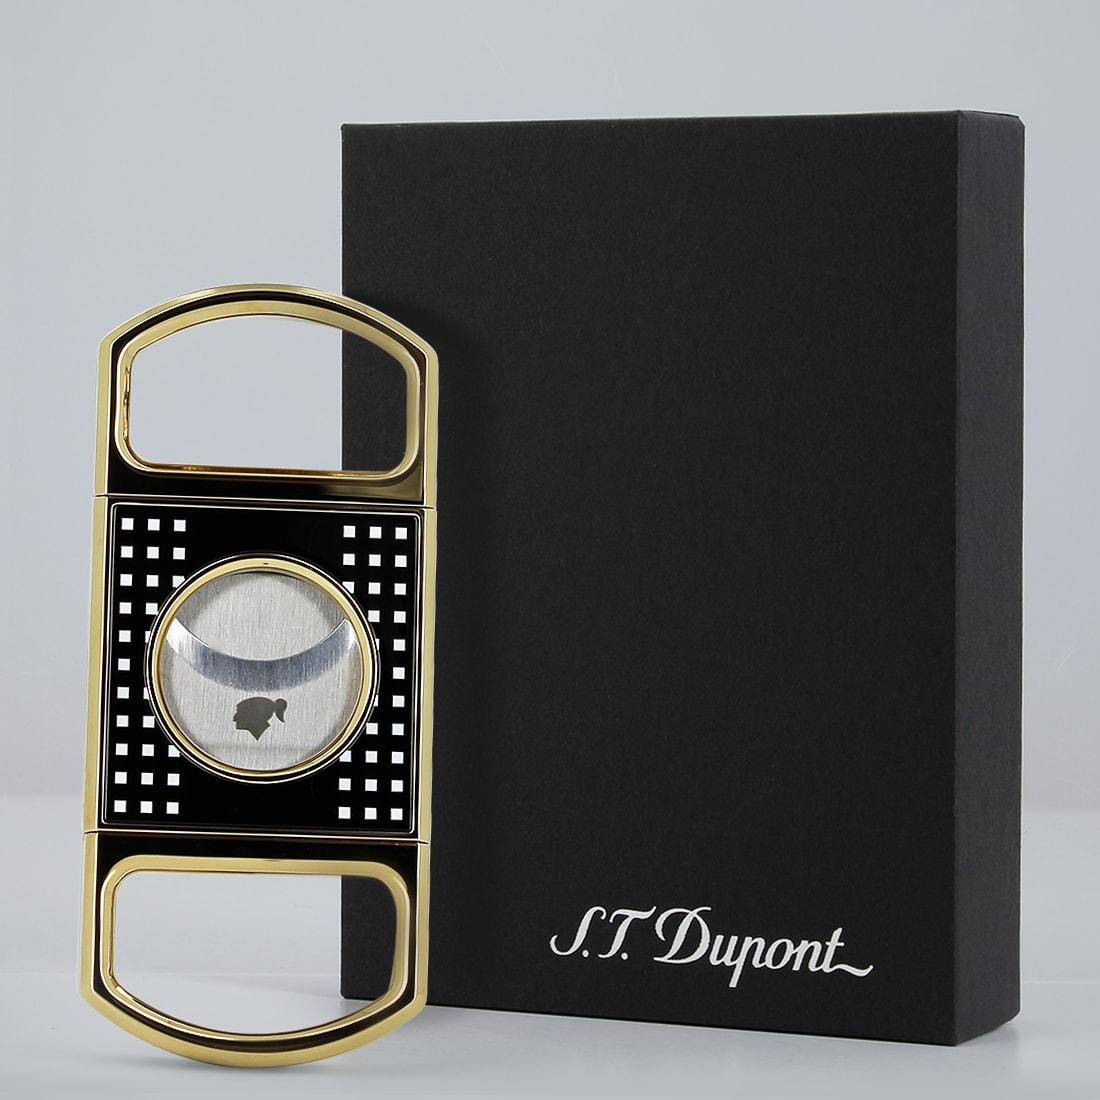 Photo #2 de Coupe cigares S.T. Dupont Behike